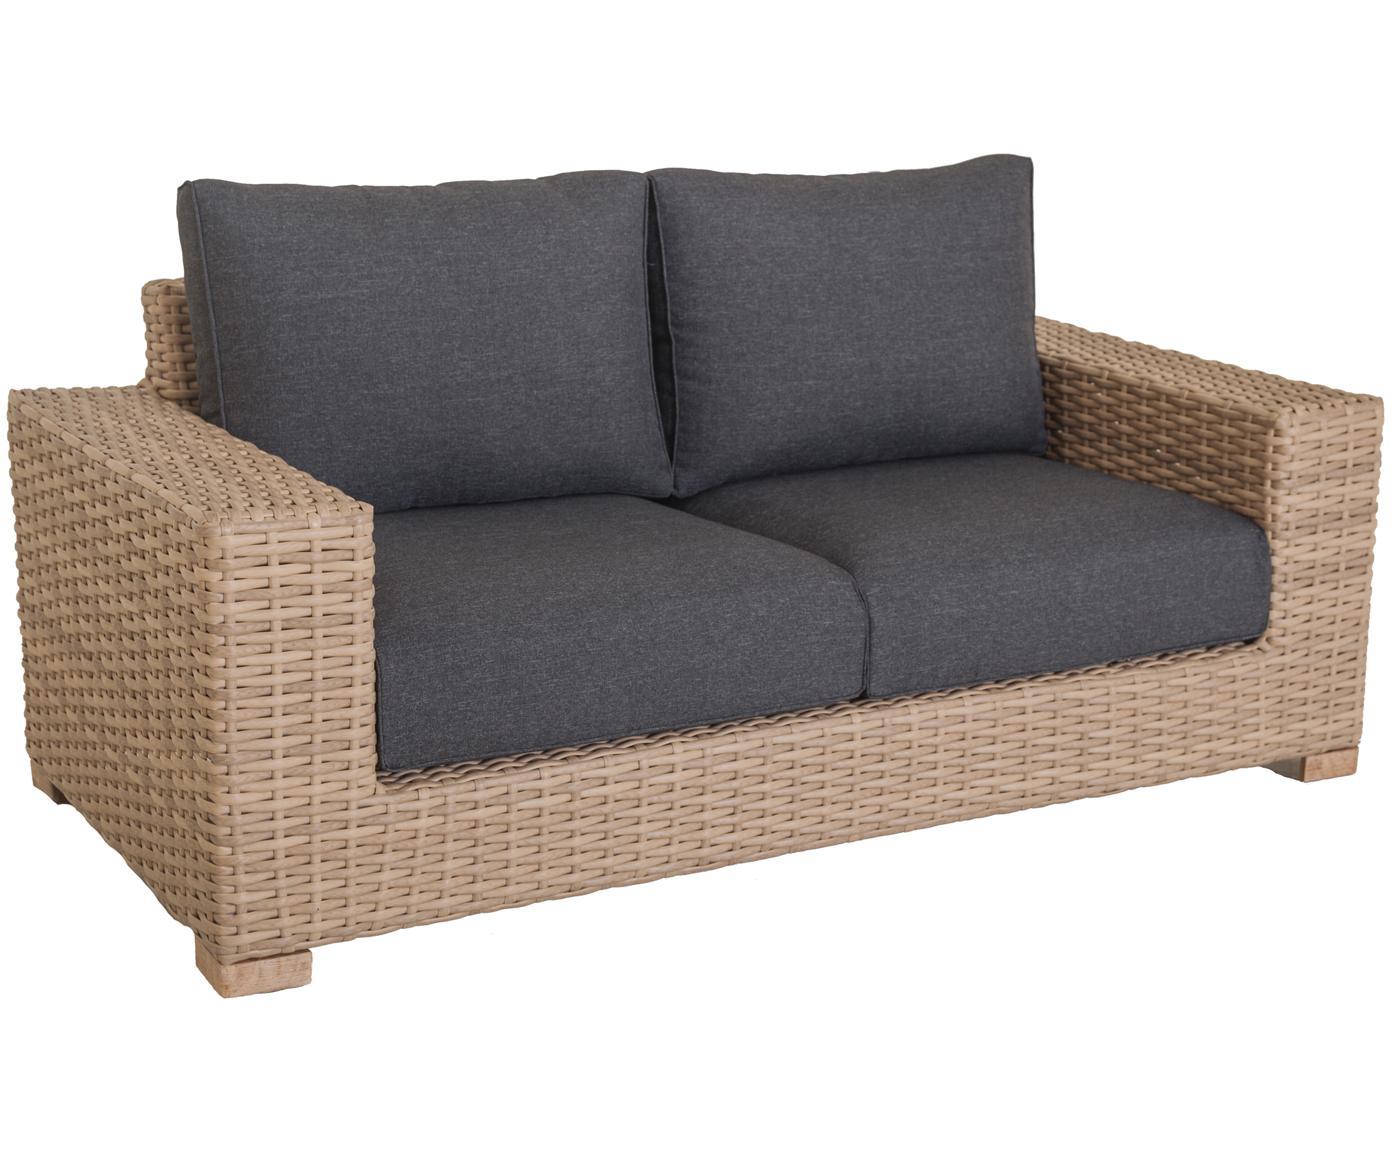 Garten-Loungesofa Saba aus Polyratten (2-Sitzer), Korpus: Polyrattan, UV-beständig, Gestell: Aluminium, Bezug: Polyester, UV-beständig u, Braun, B 180 x T 88 cm